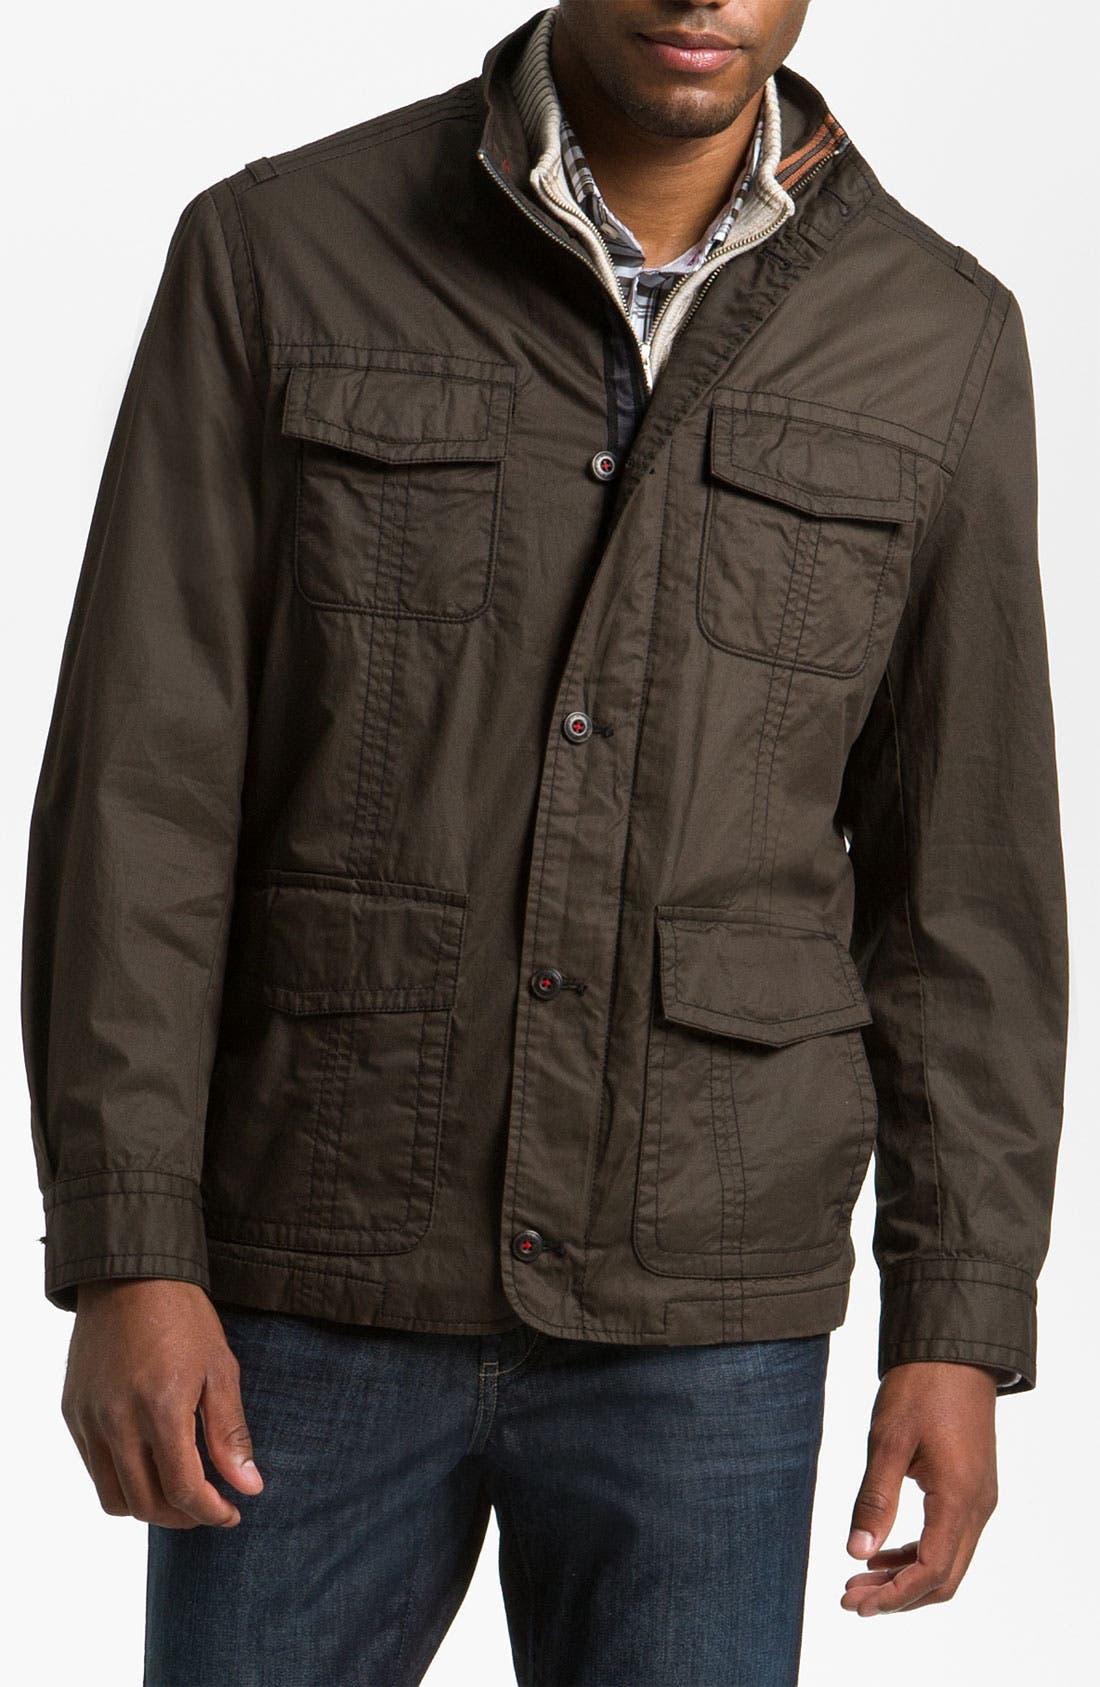 Alternate Image 1 Selected - Tommy Bahama Denim 'Range Roamer' Jacket